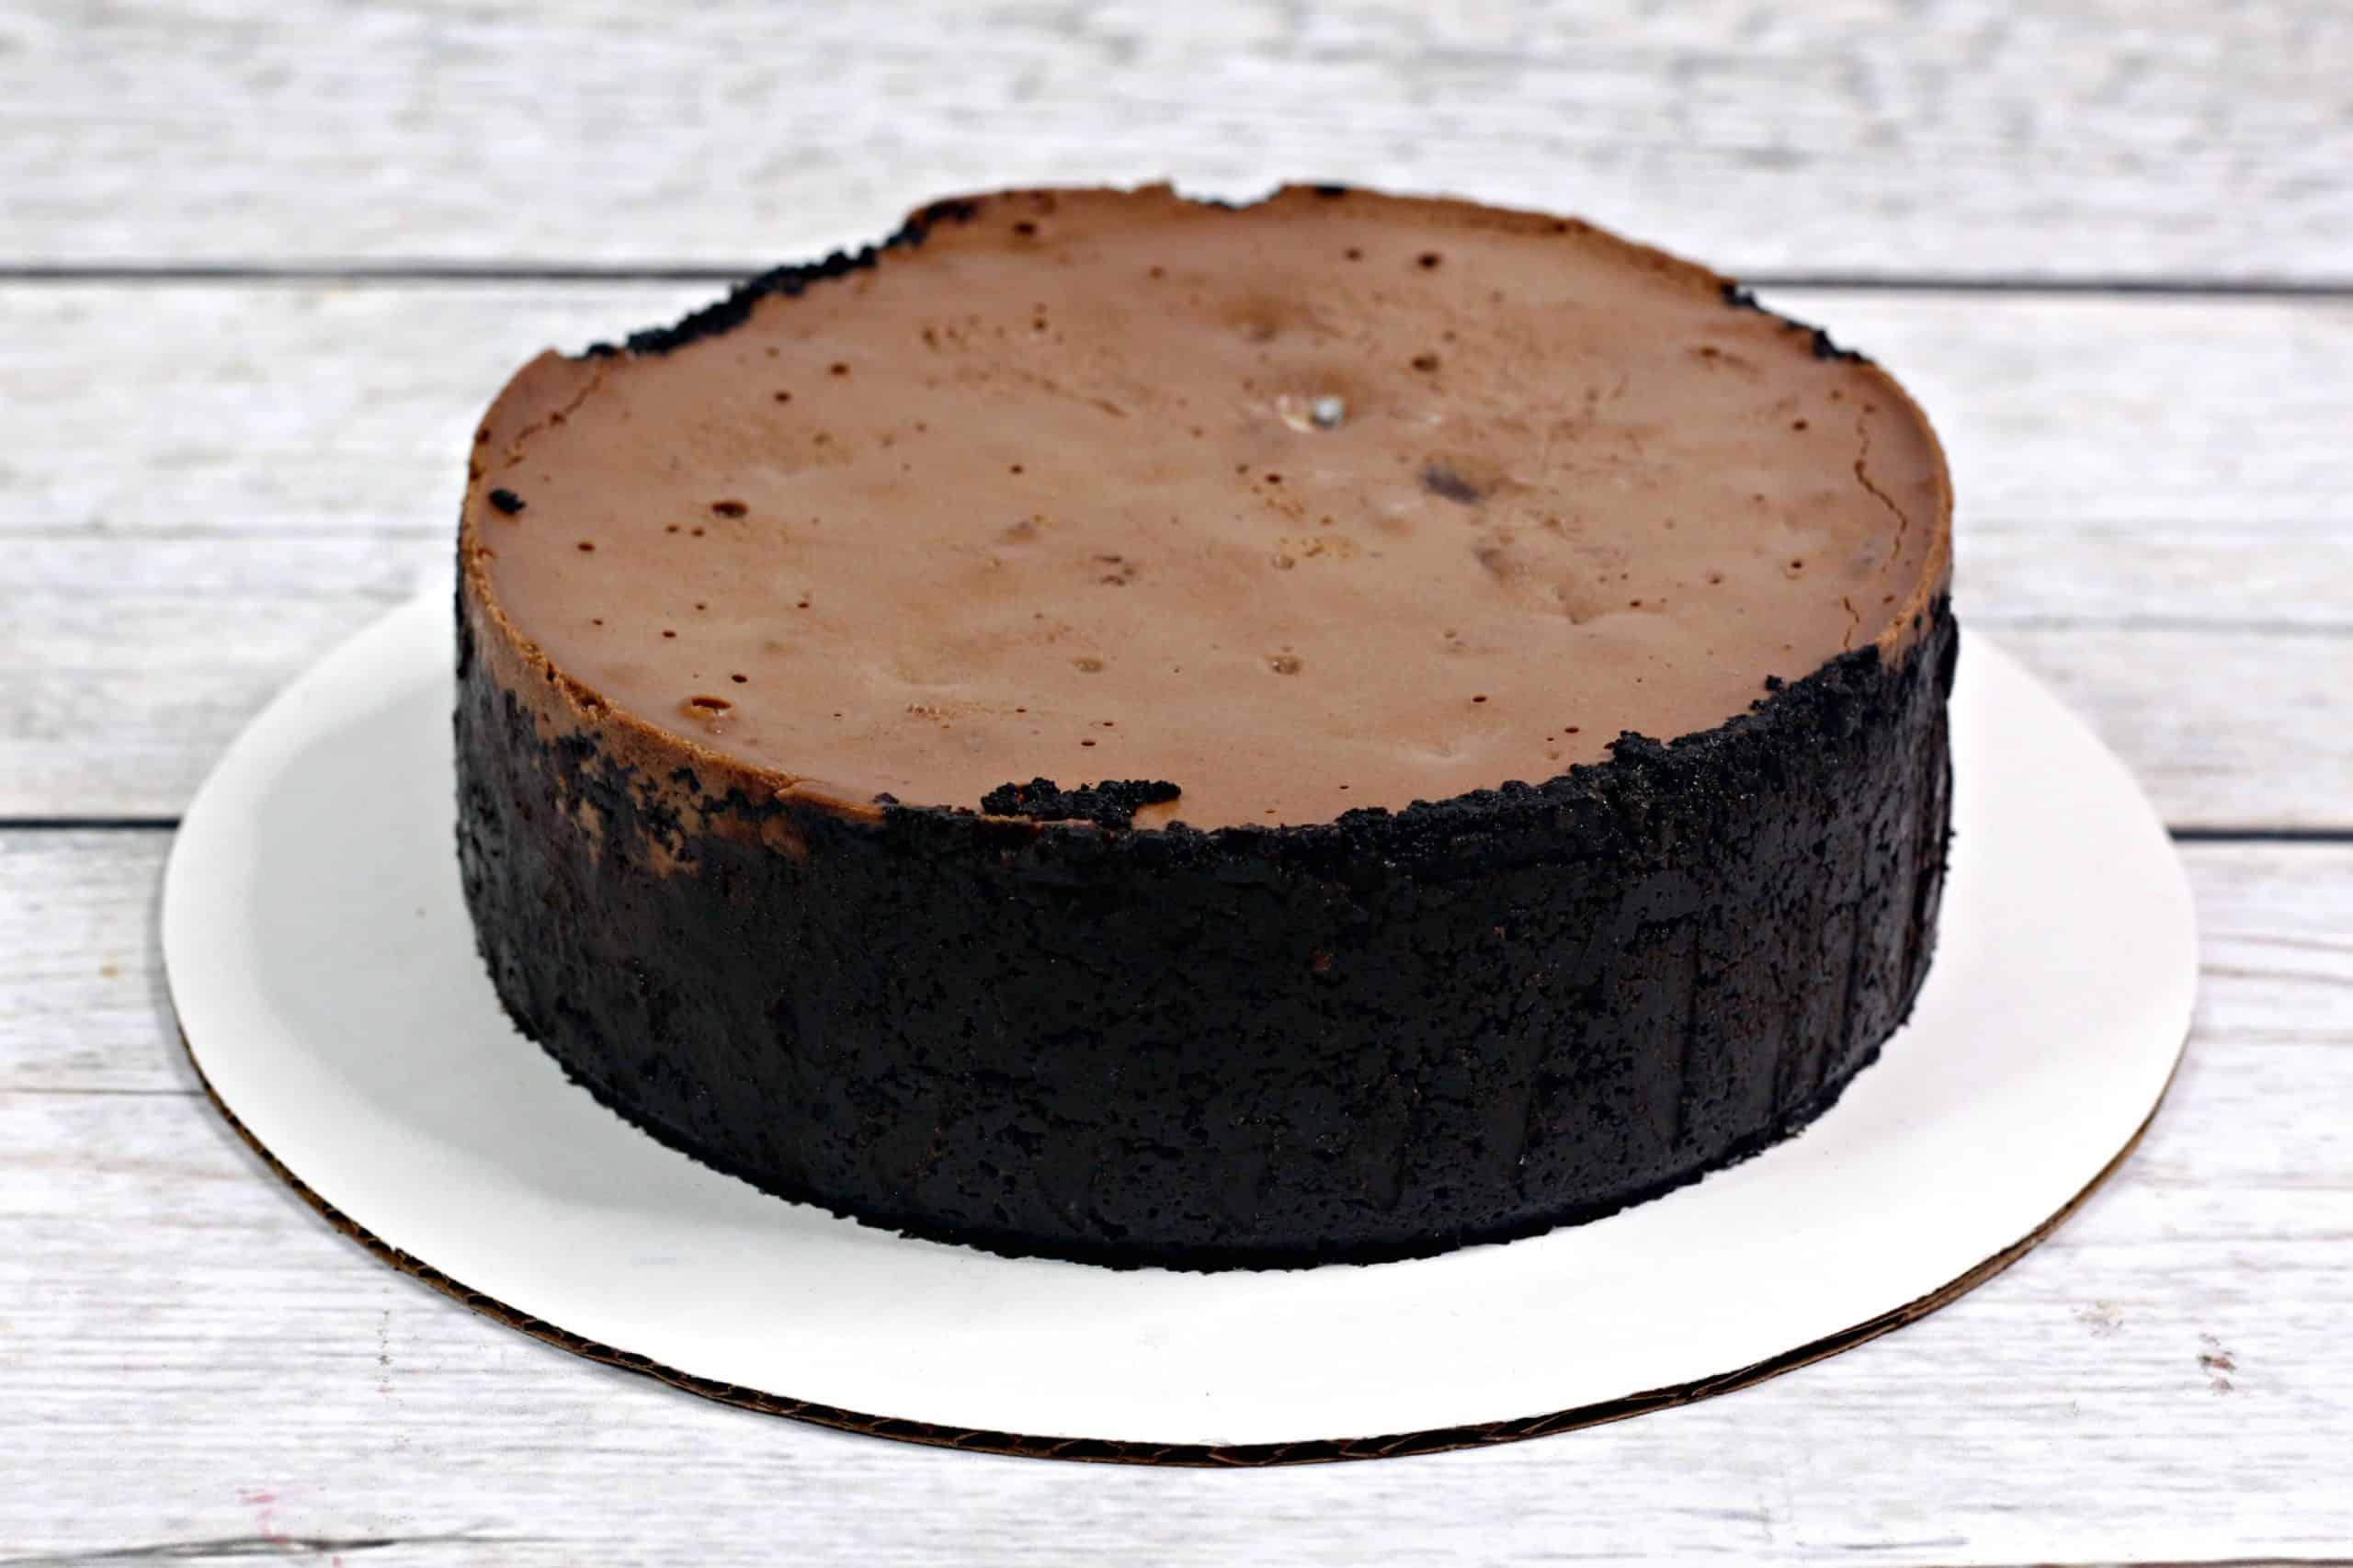 Chocolate Cheesecake whole